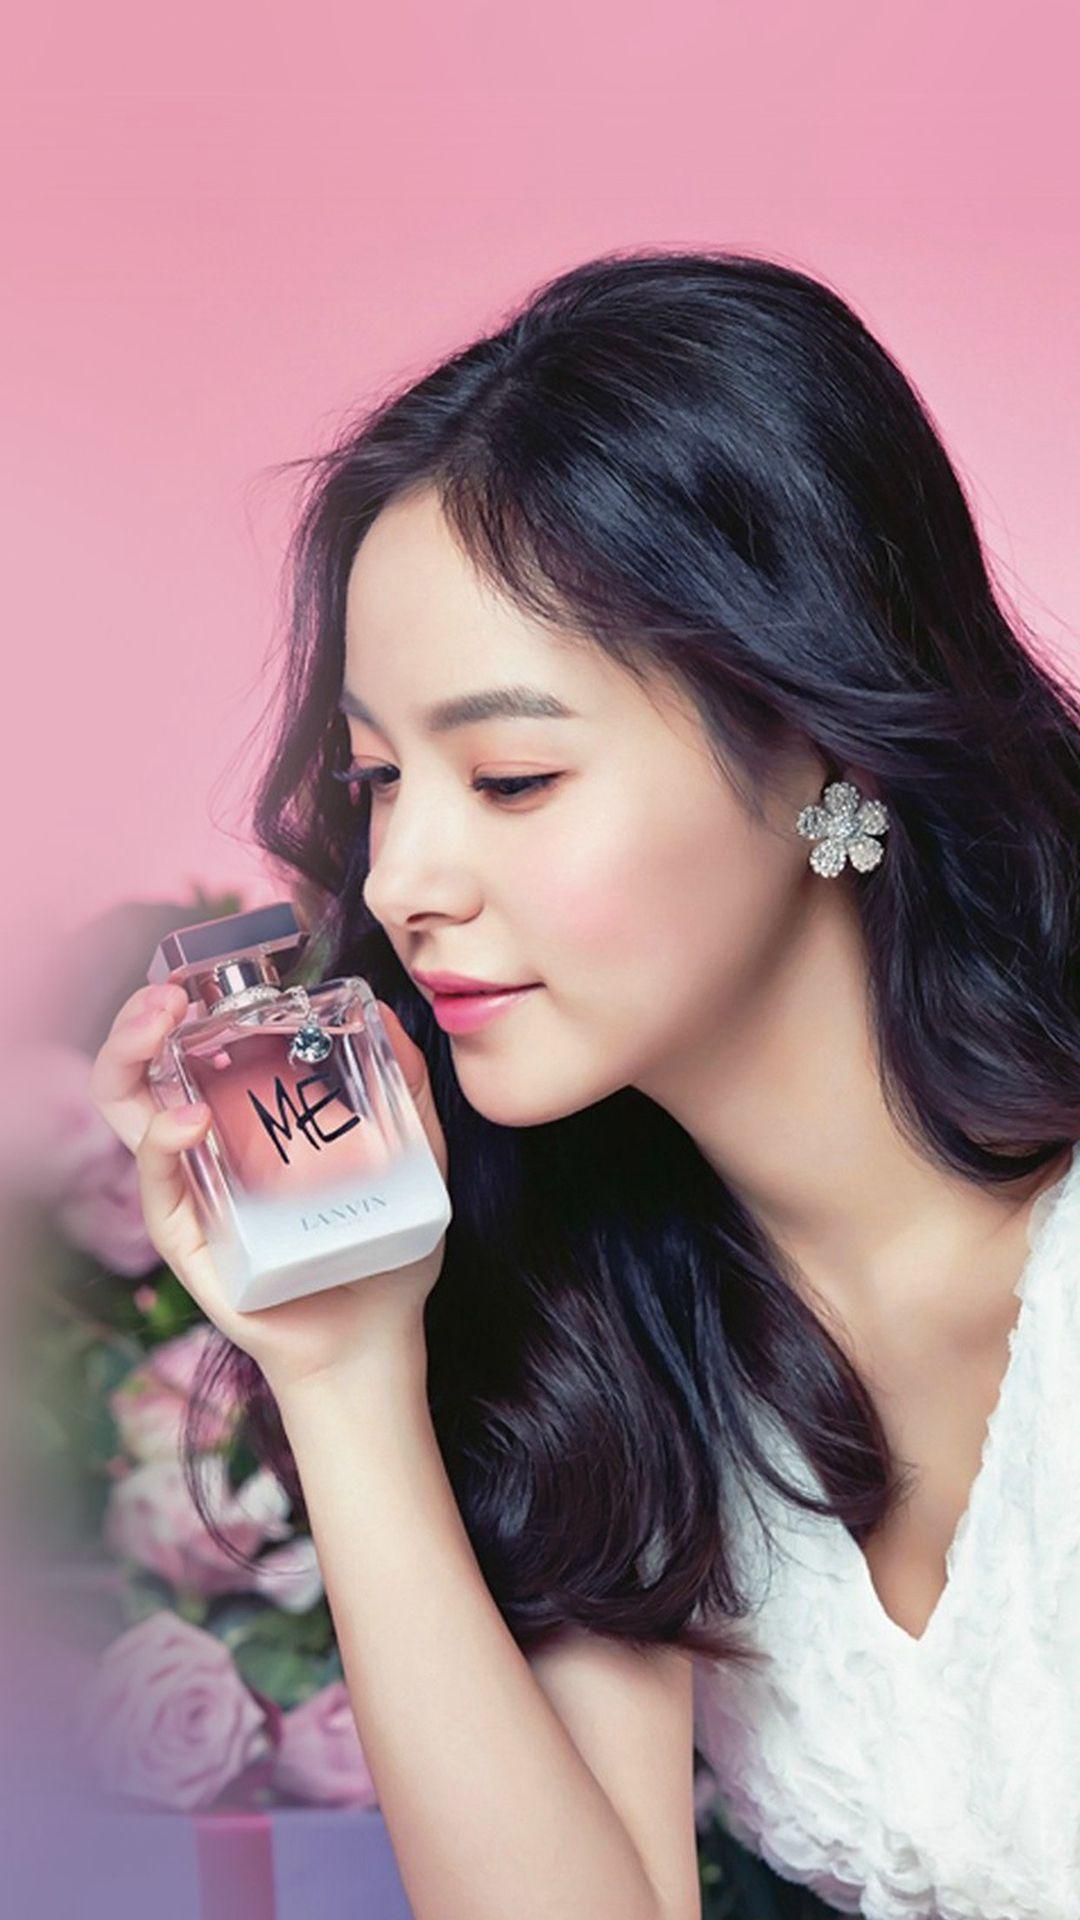 Iphone 6 wallpaper tumblr kpop - Min Hyorin Pink Ad Cute Kpop Iphone 6 Plus Wallpaper